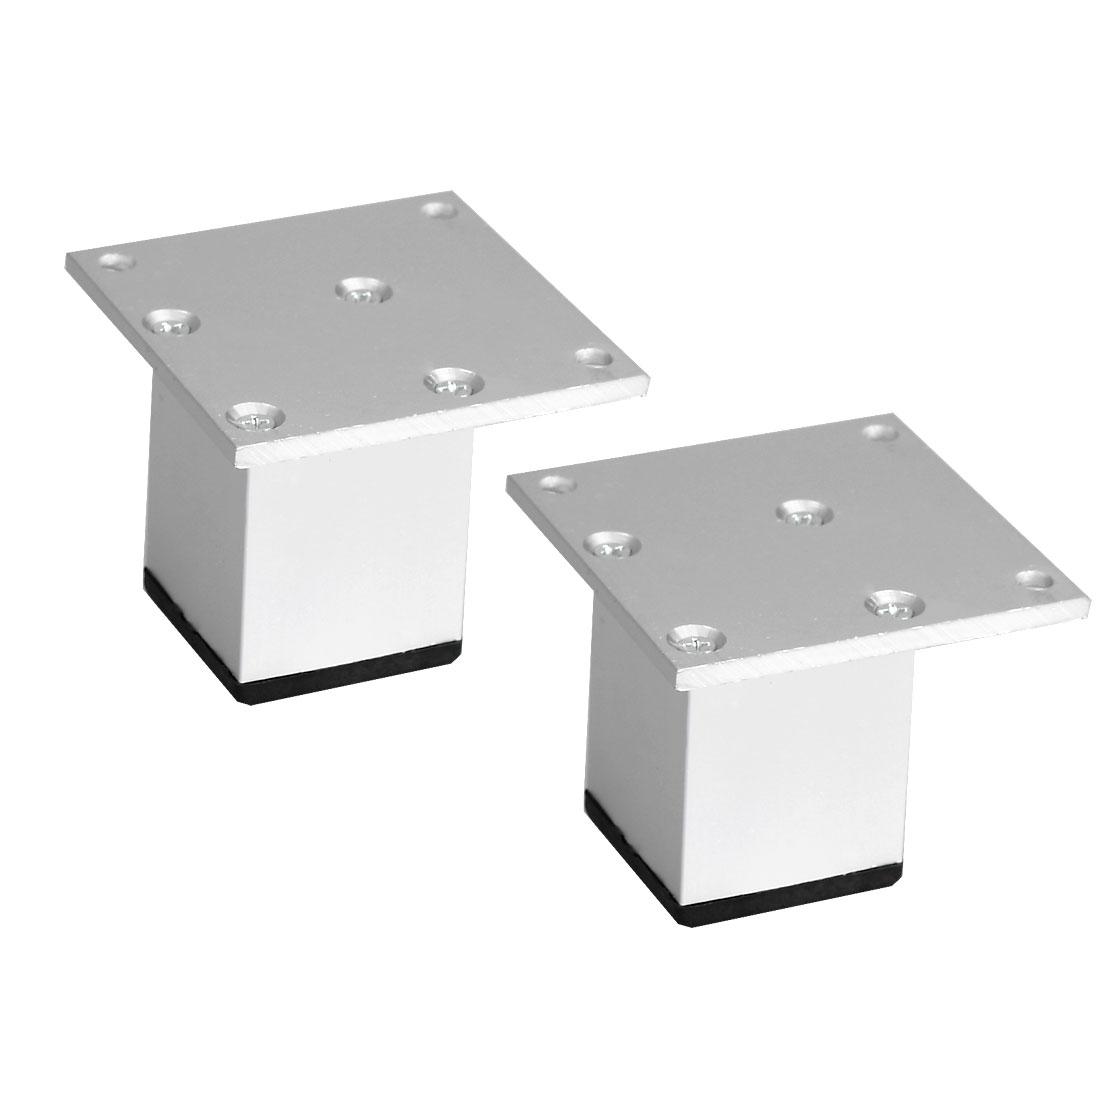 "2"" Furniture Legs Aluminium Alloy Table Feet Replacement Height Adjuster 2pcs"